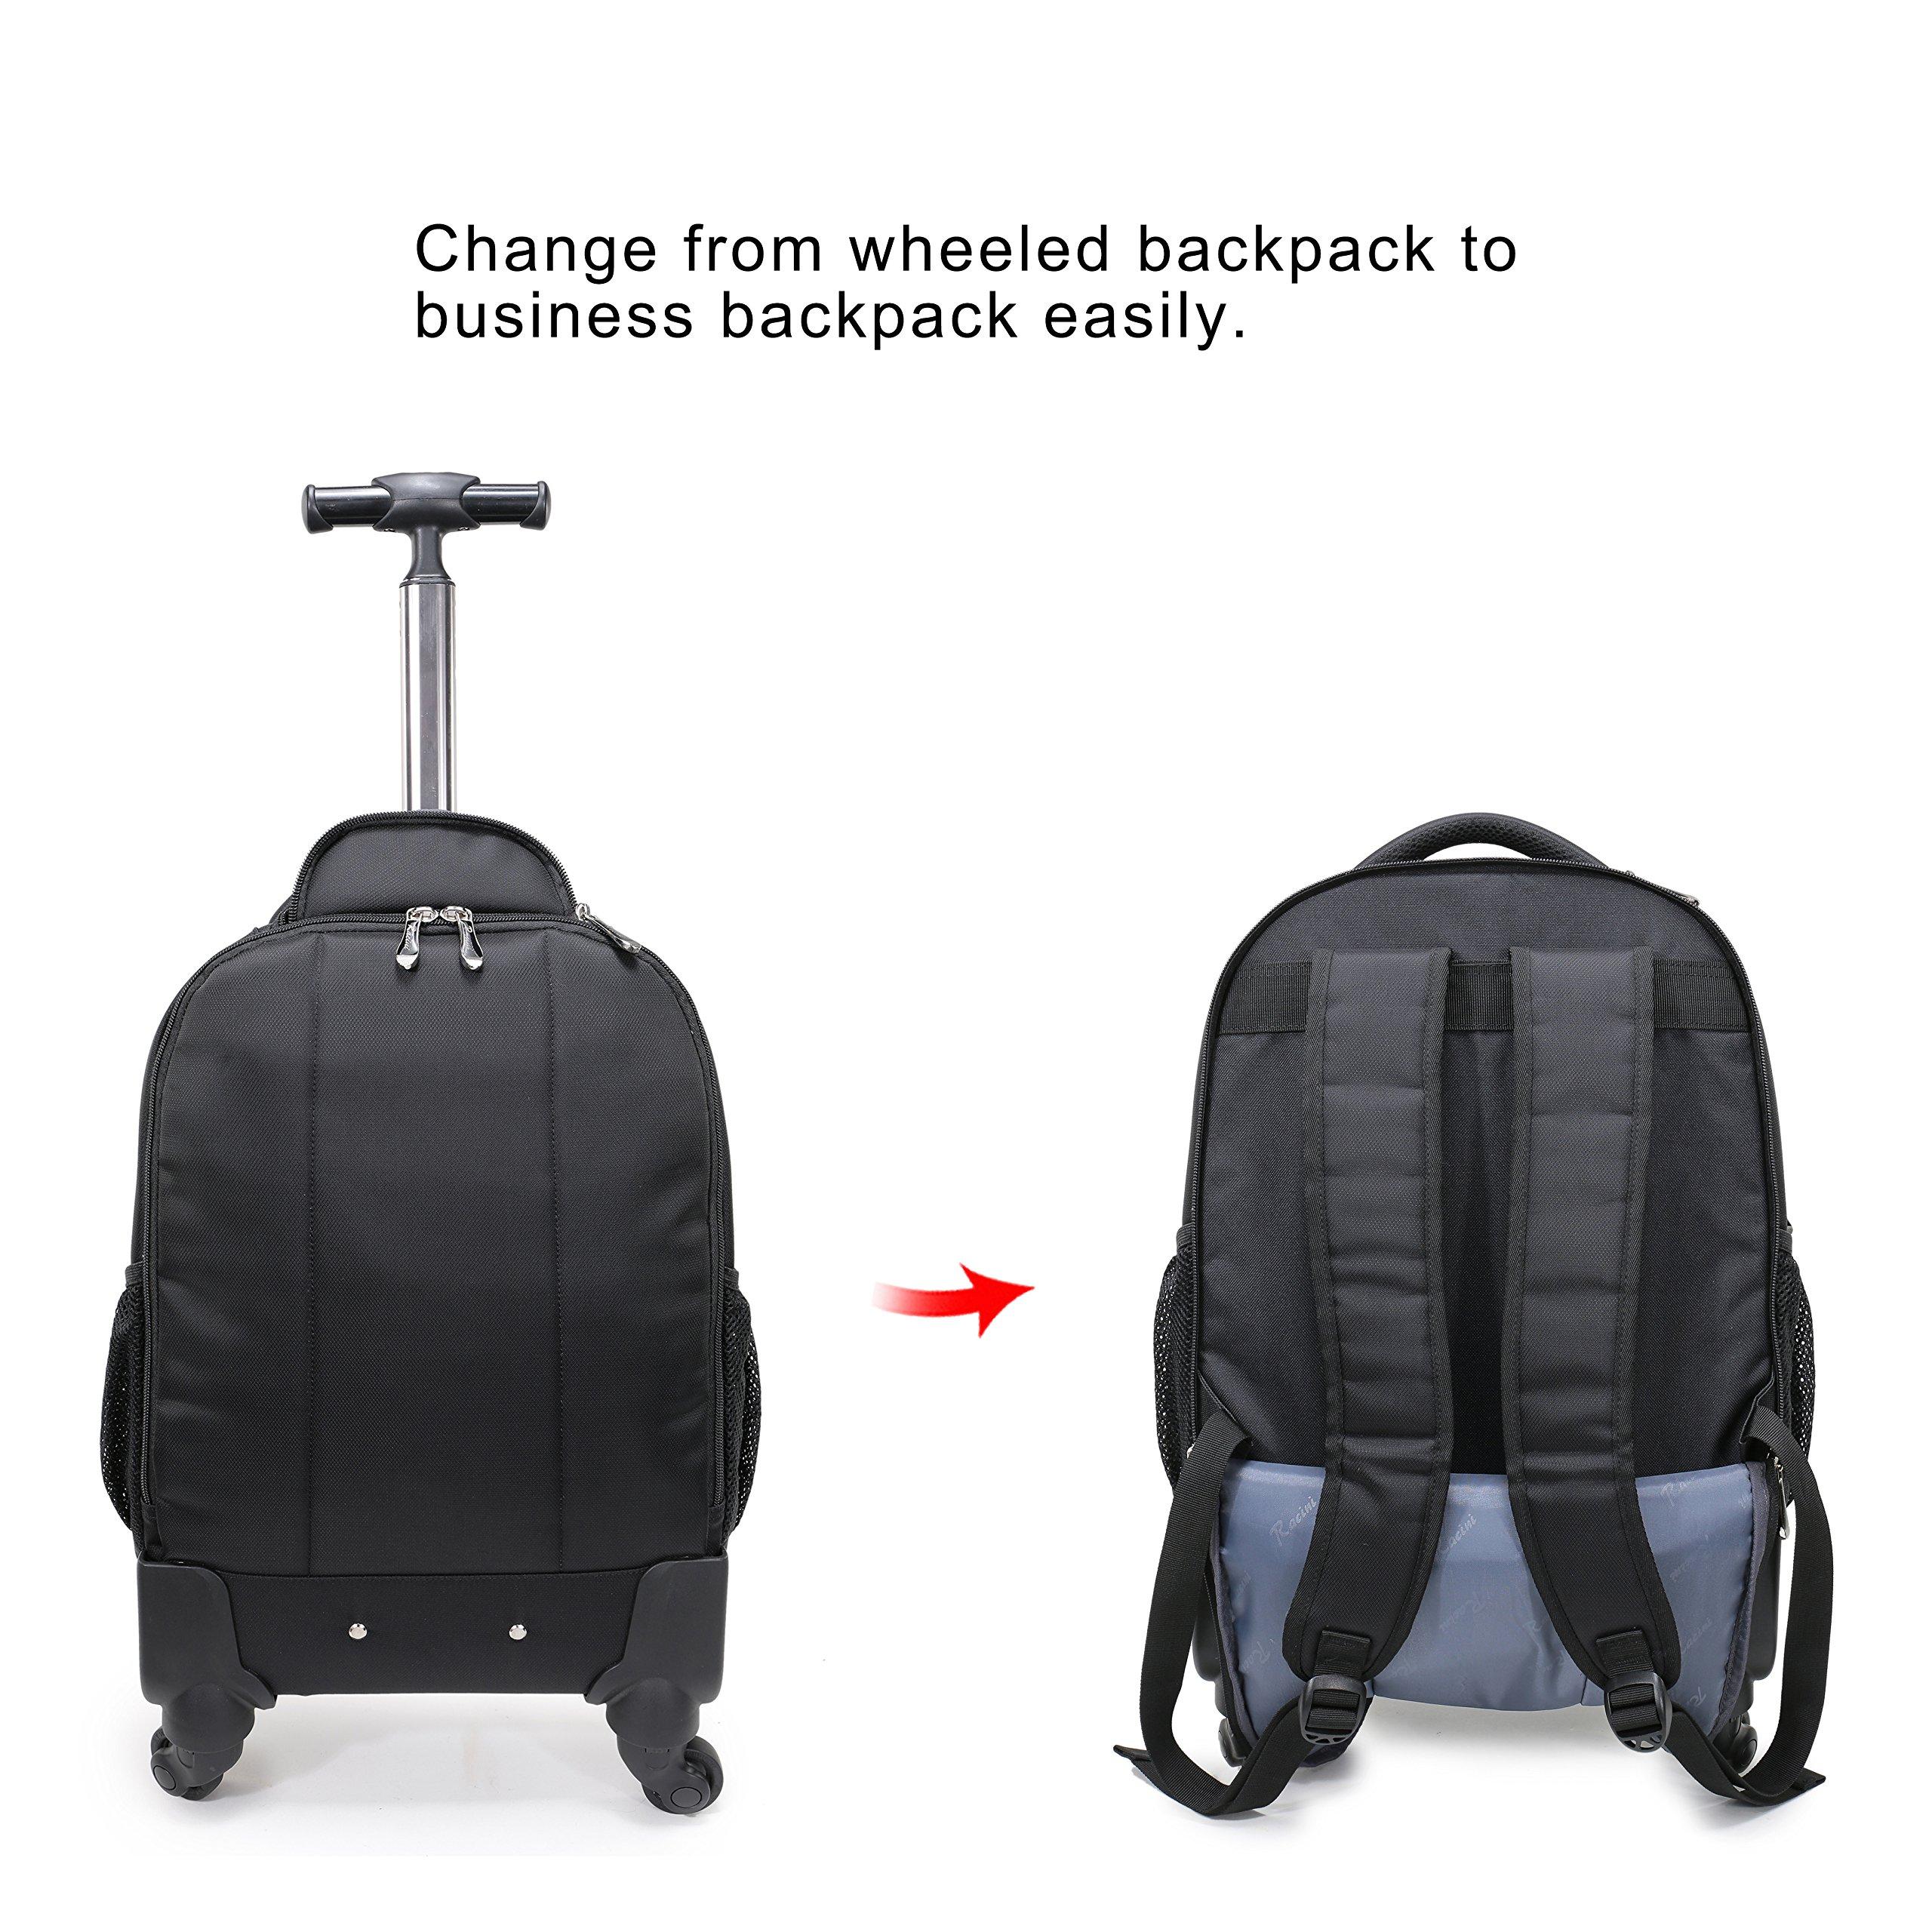 Racini Nylon Waterproof Rolling Backpack, Freewheel Travel School Wheeled Backpack, Carry-on Luggage with Anti-theft Zippers (Black) by Racini (Image #4)